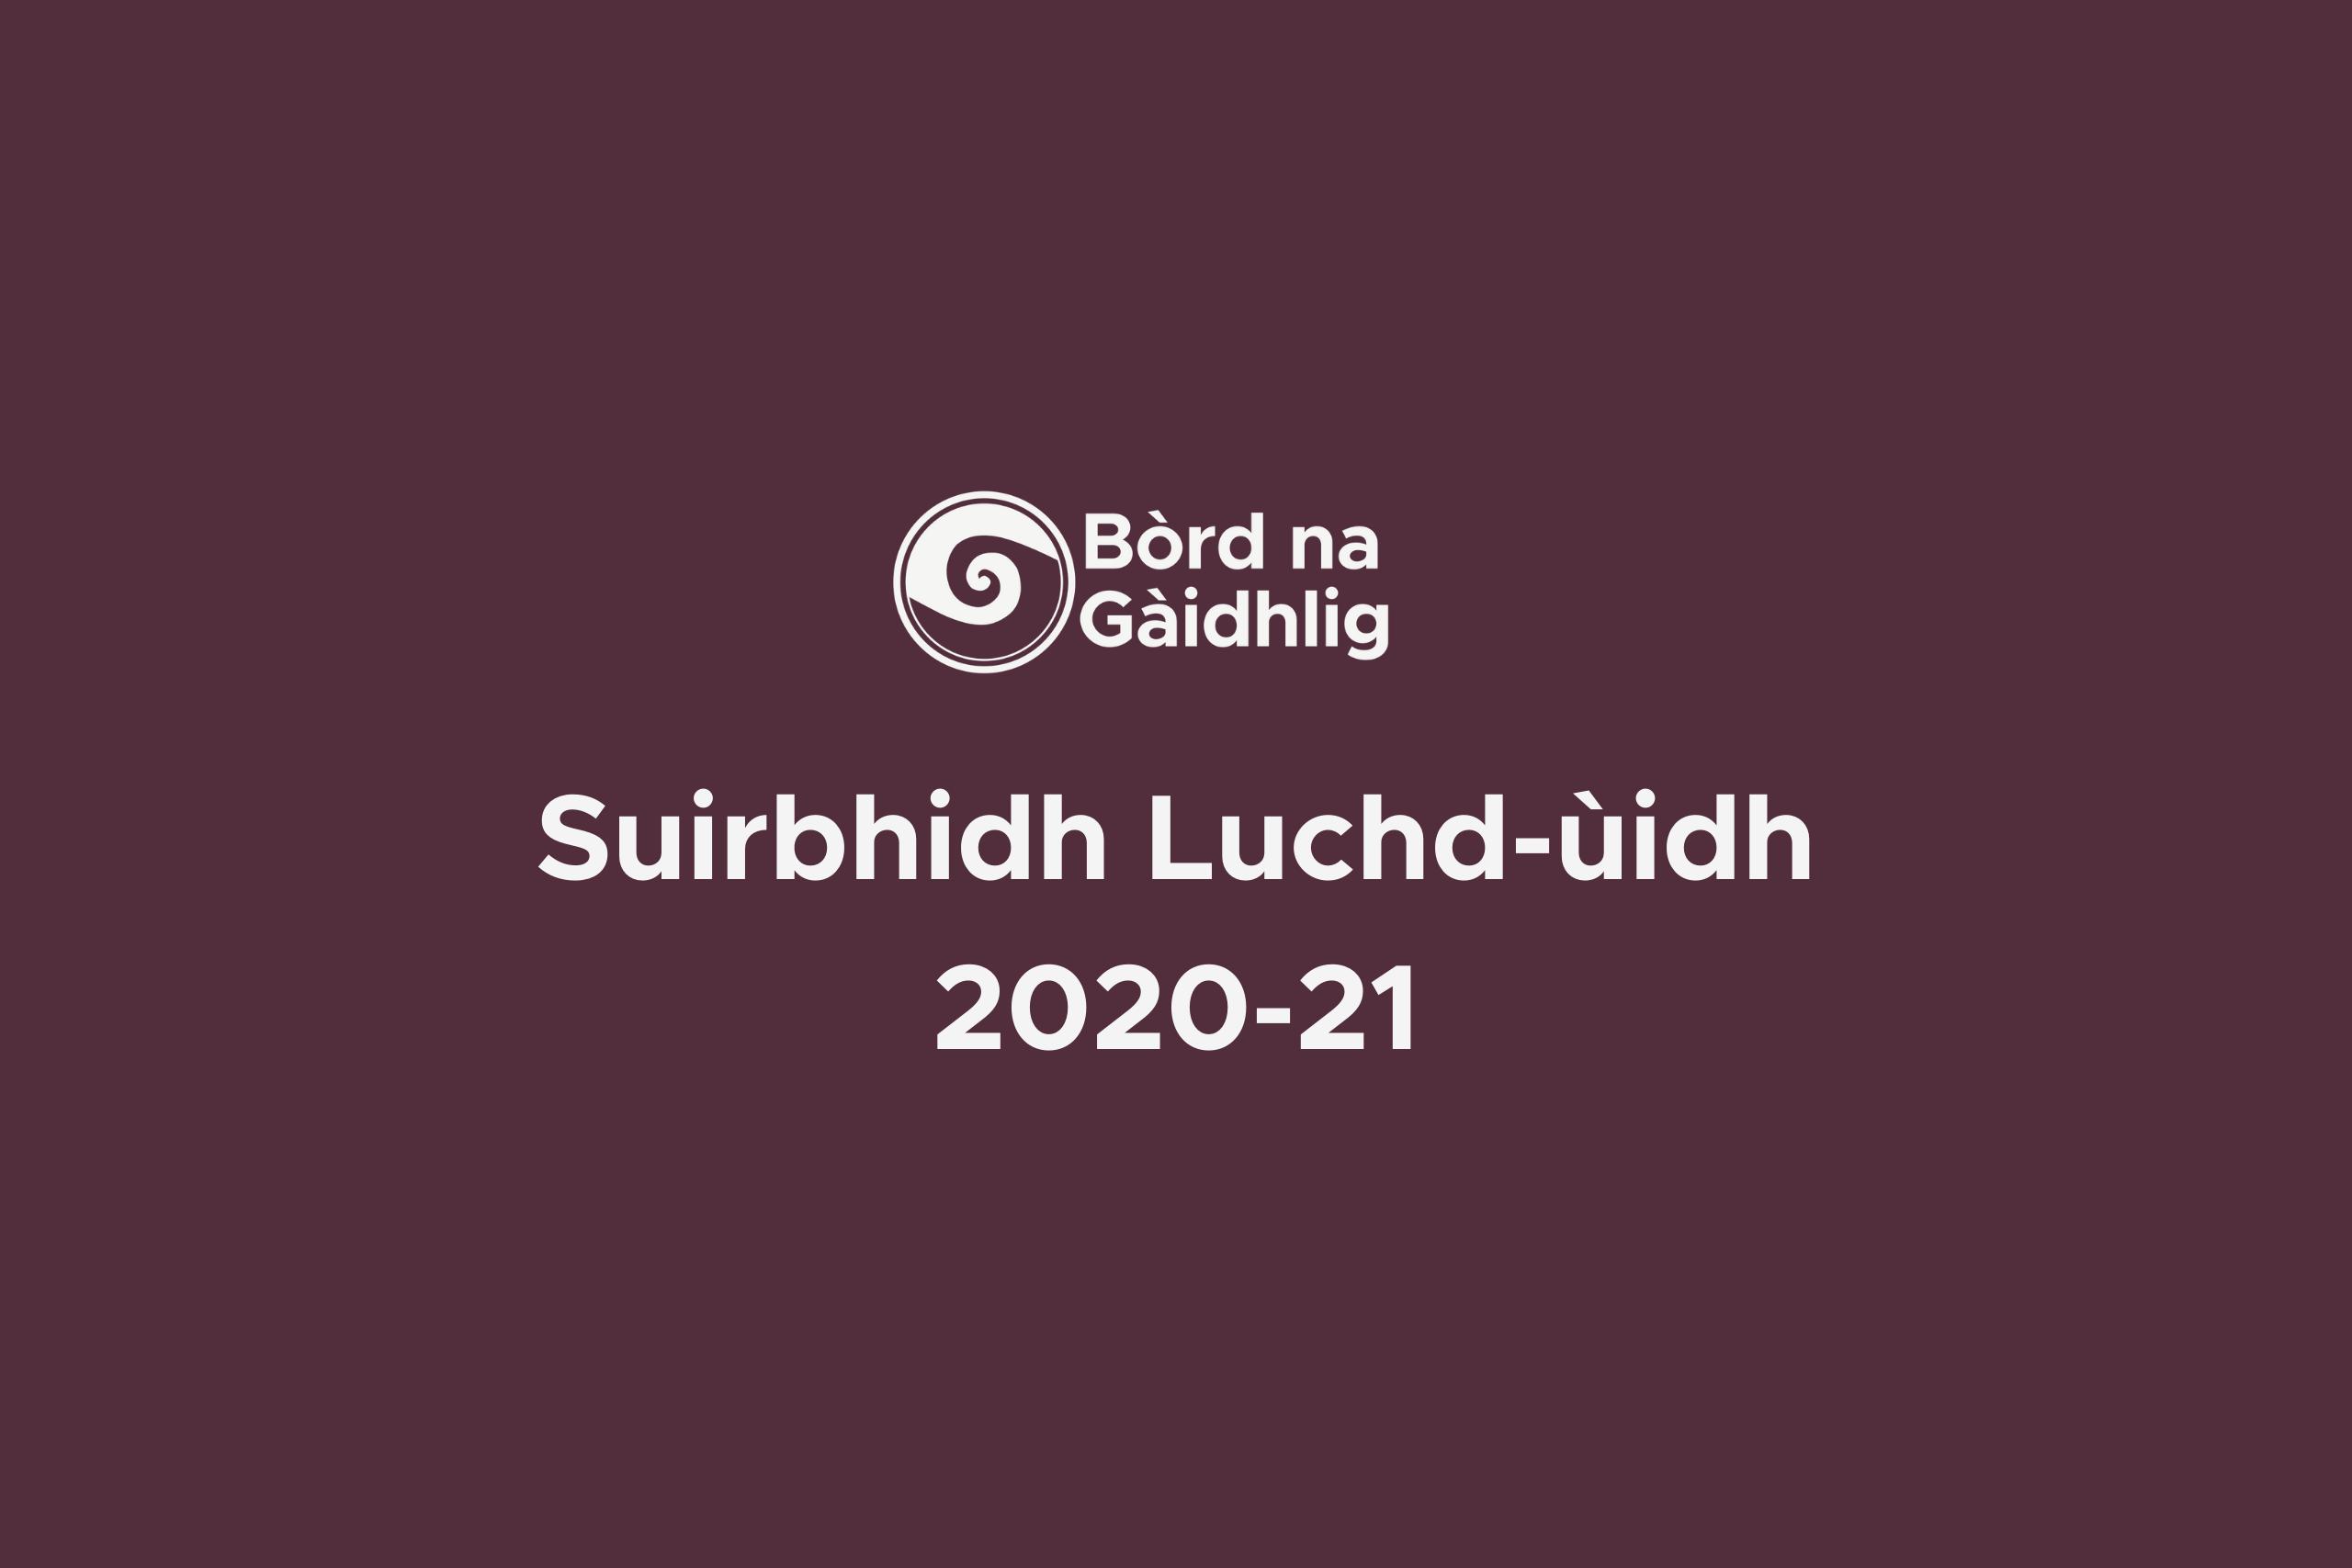 Stakeholder Survey 2020-21